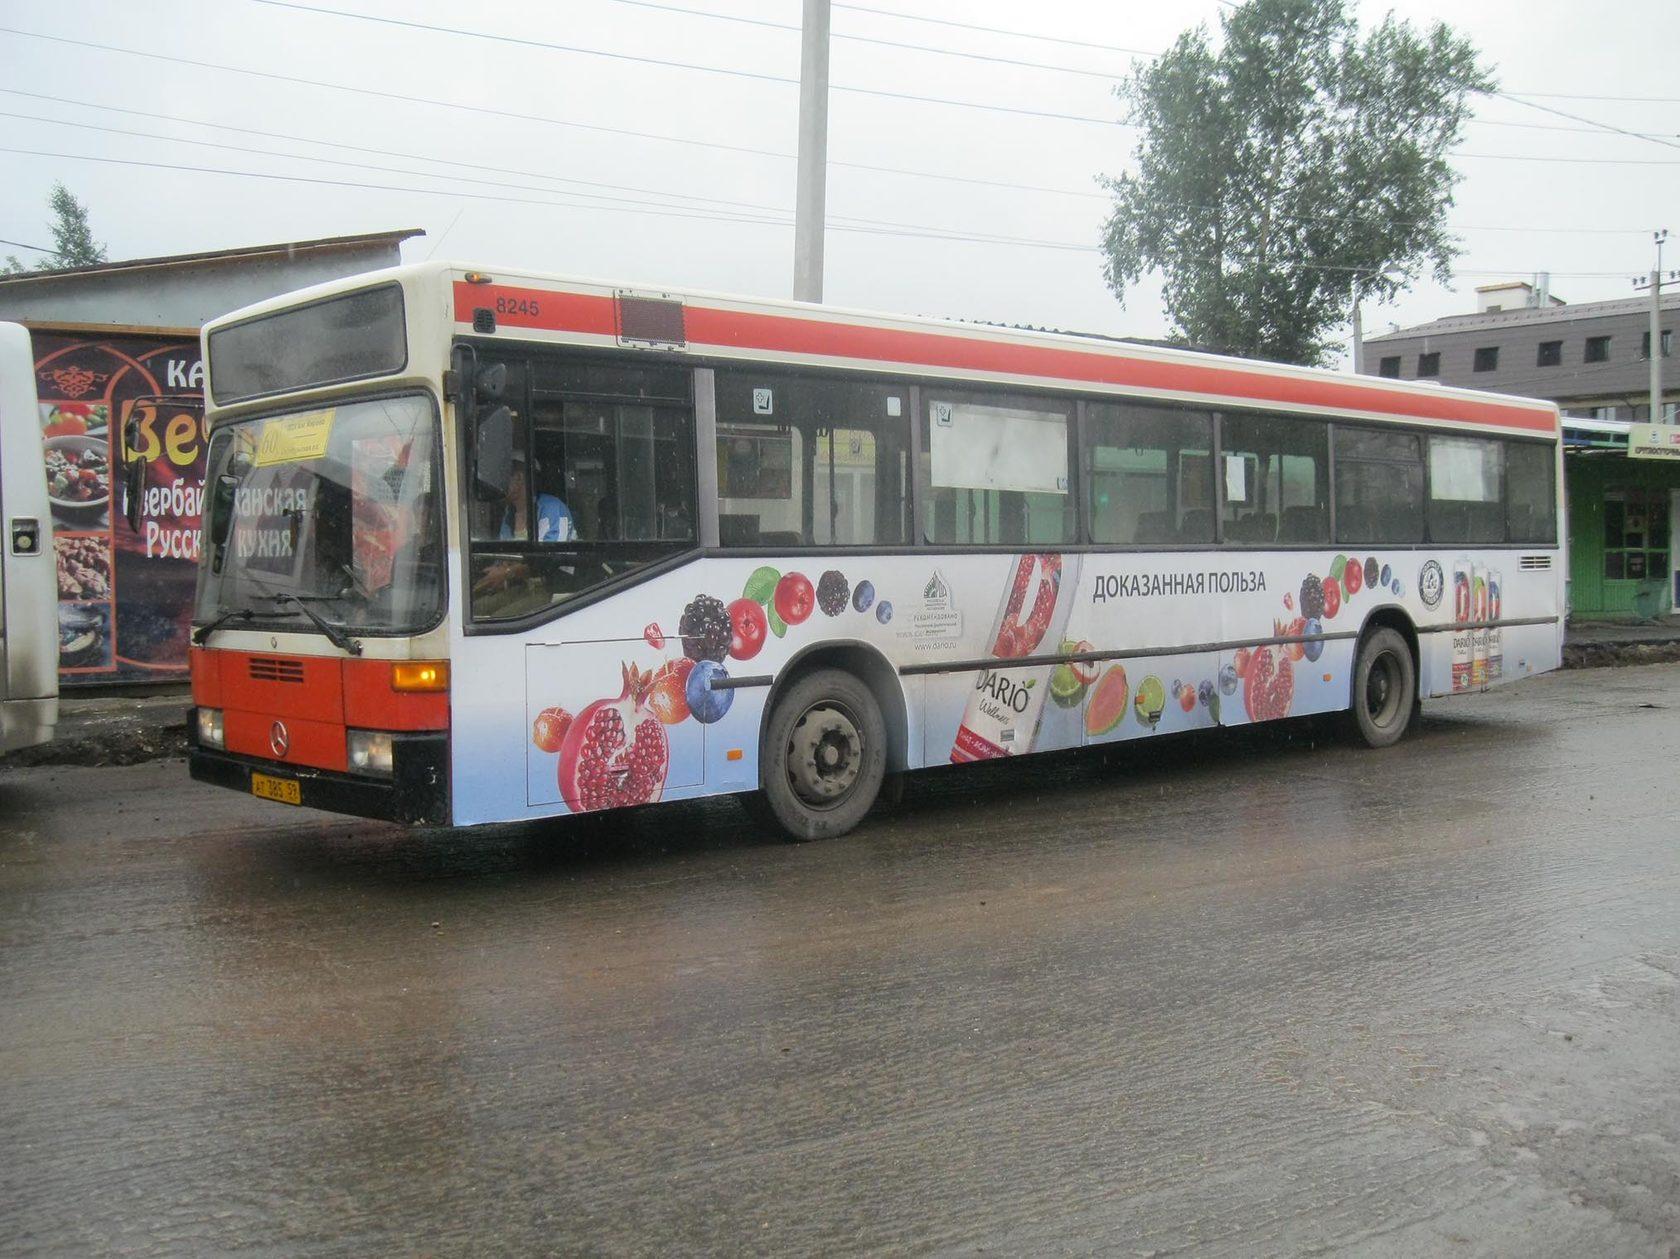 AMEDIA OUTDOOR | Транзитная реклама в ХМАО-Югре